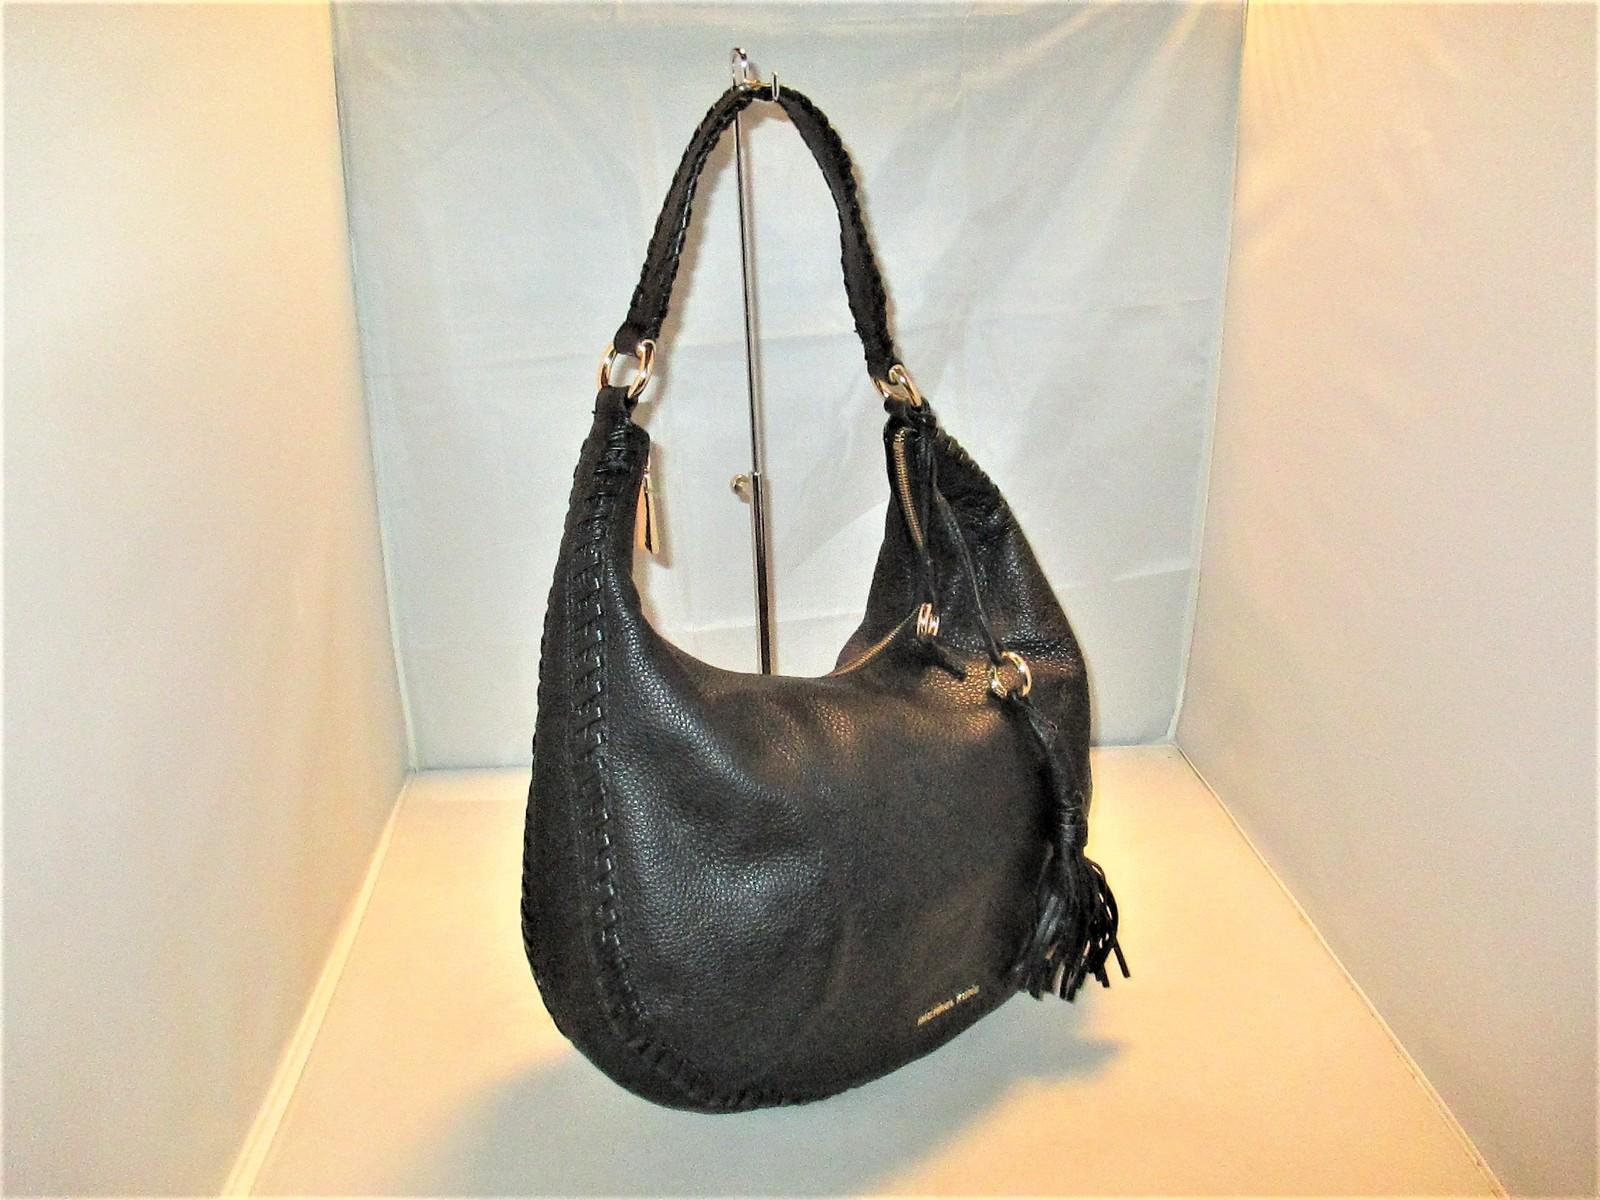 da64ad0e5484f8 Michael Kors Handbag Lauryn Large Leather and 50 similar items